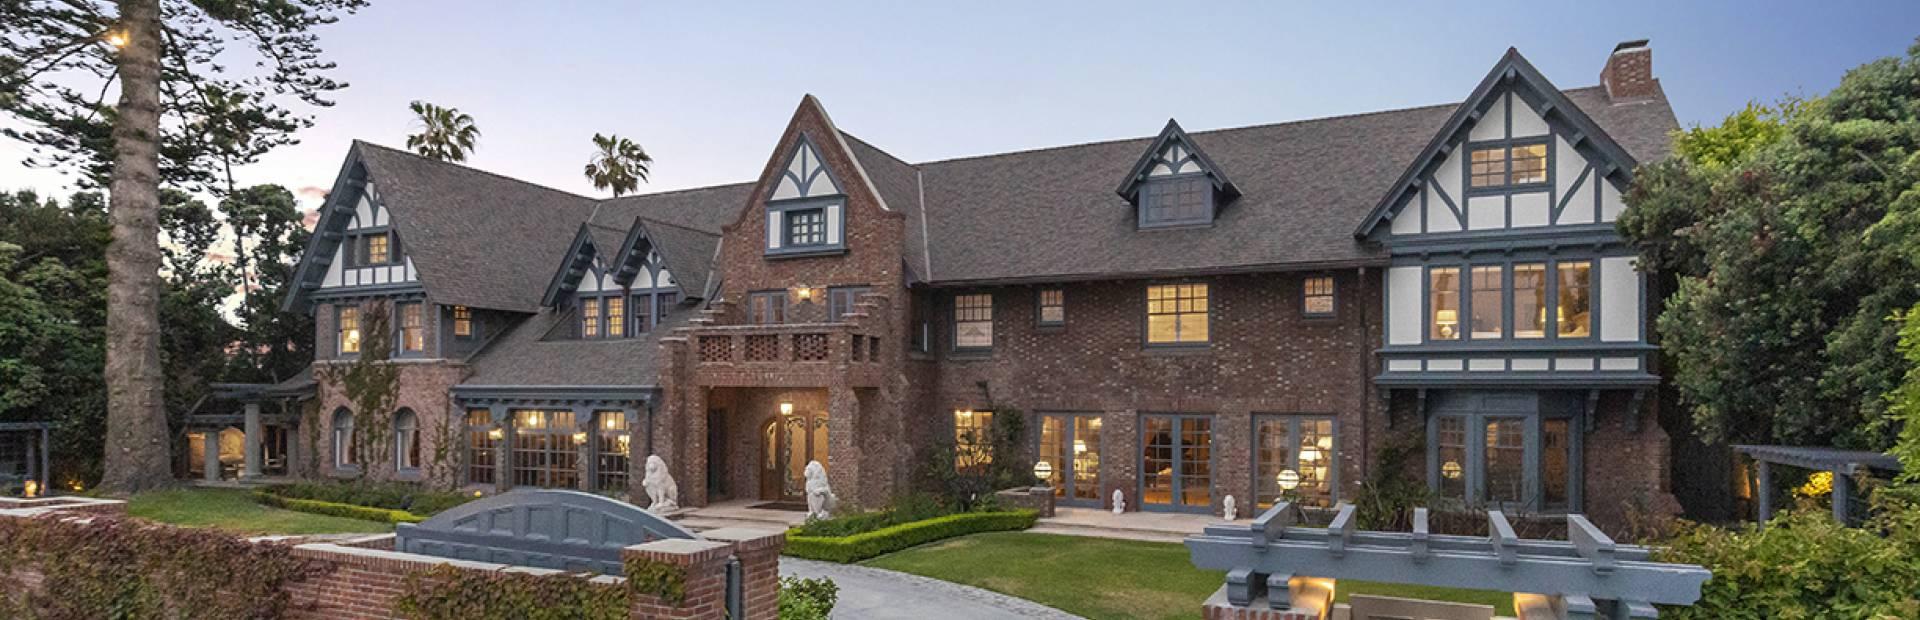 1015 Ocean Boulevard, Coronado, California, United States, ,Residential,For Sale,923411